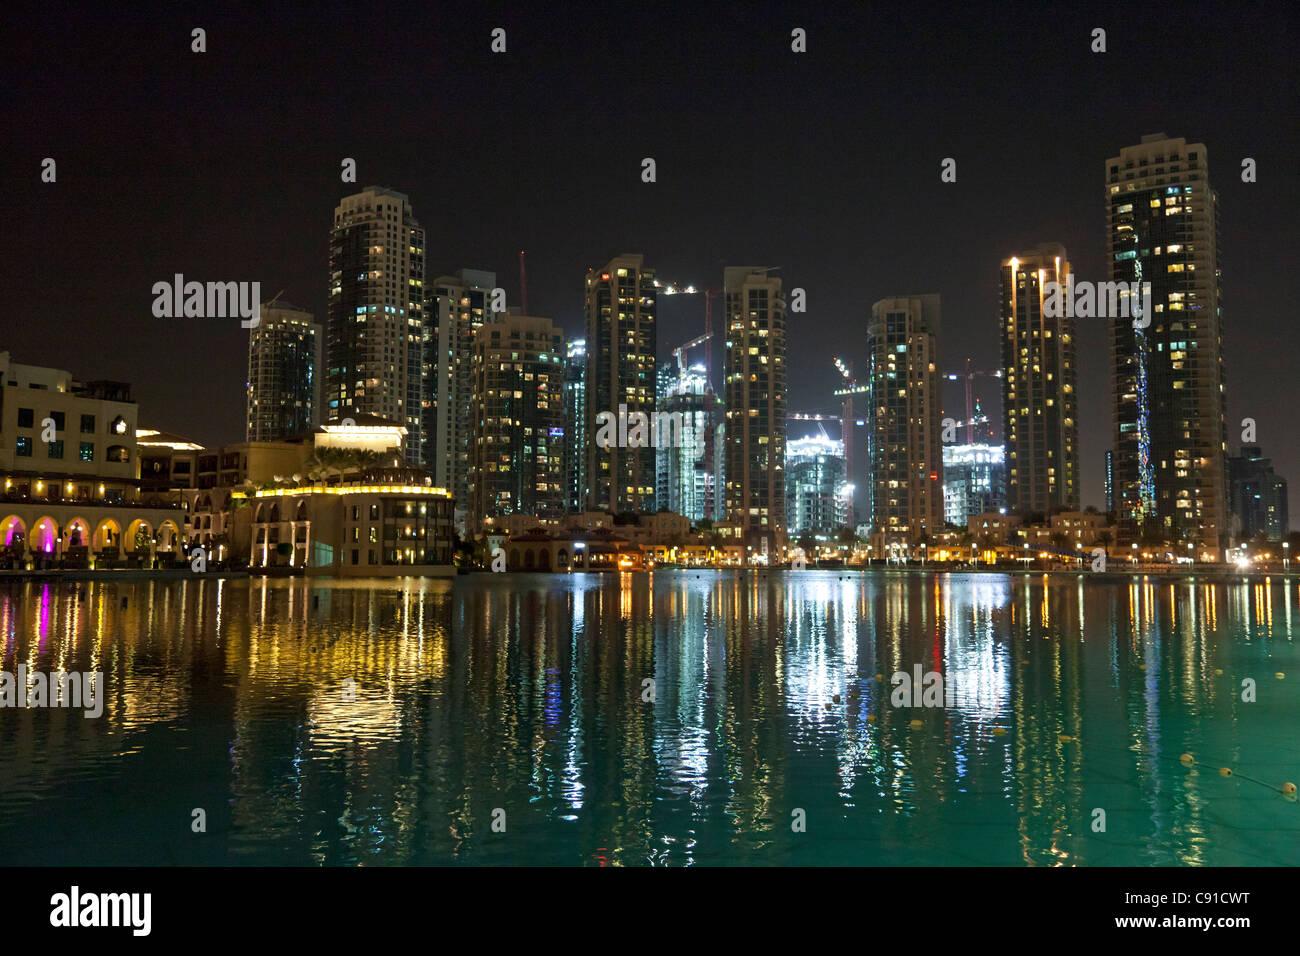 Dubai at nighttime - Stock Image